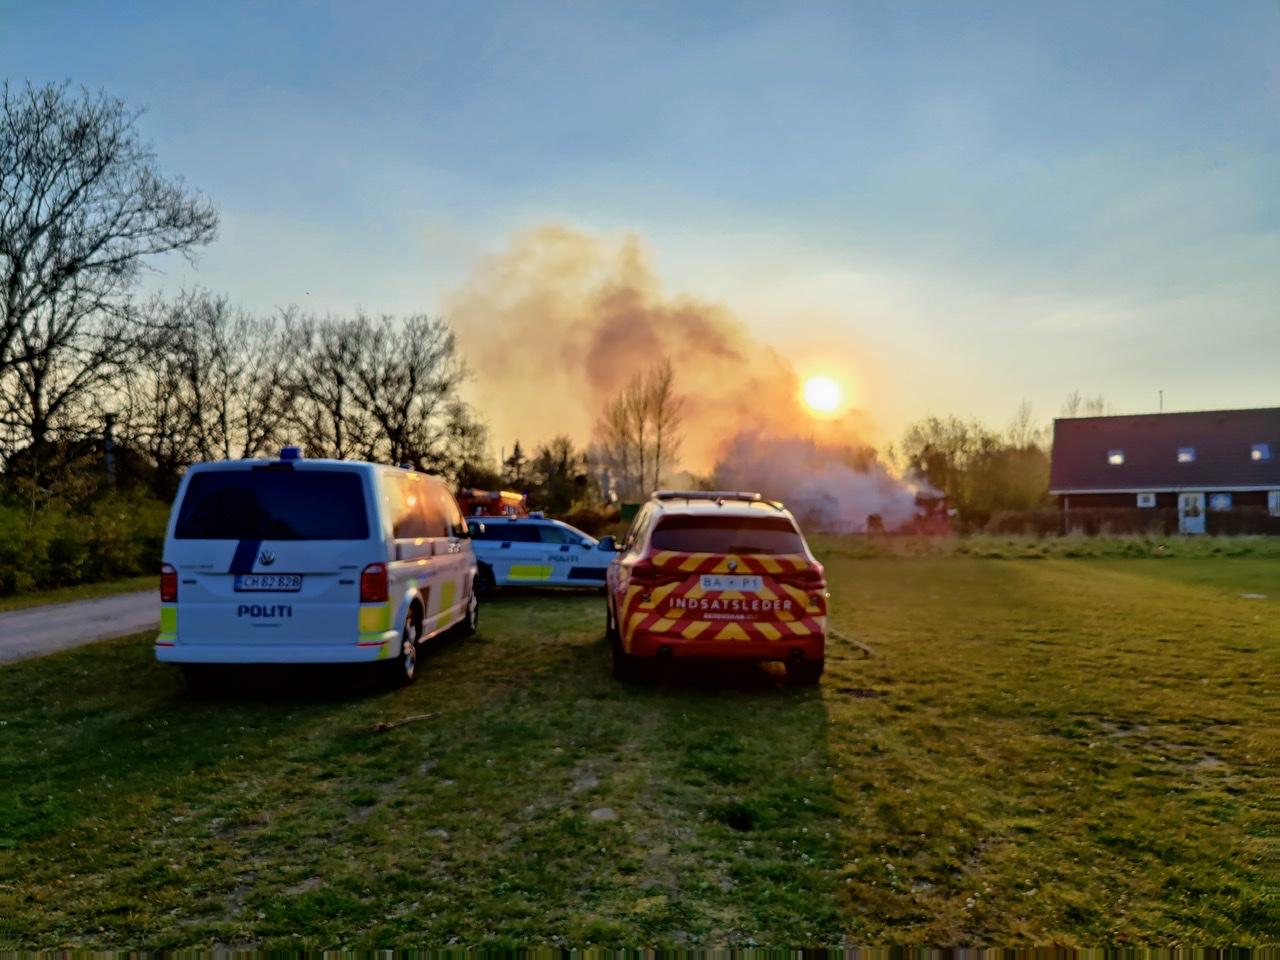 Kraftig brand i containere i Herlev